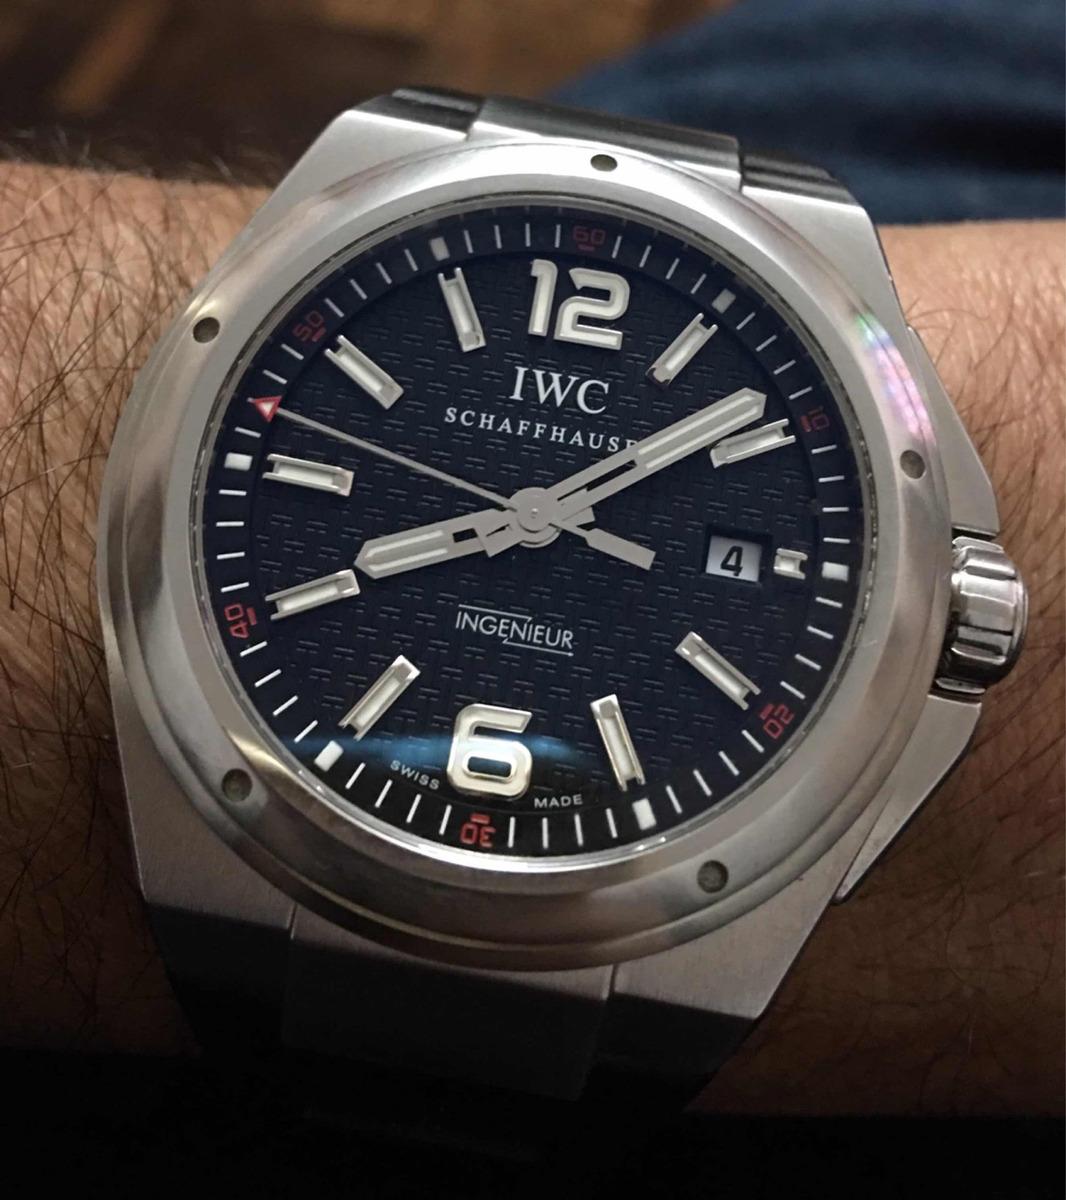 12b7089e670 relógio iwc ingenieur 2016 completo troco jaeger lecoultre. Carregando zoom.